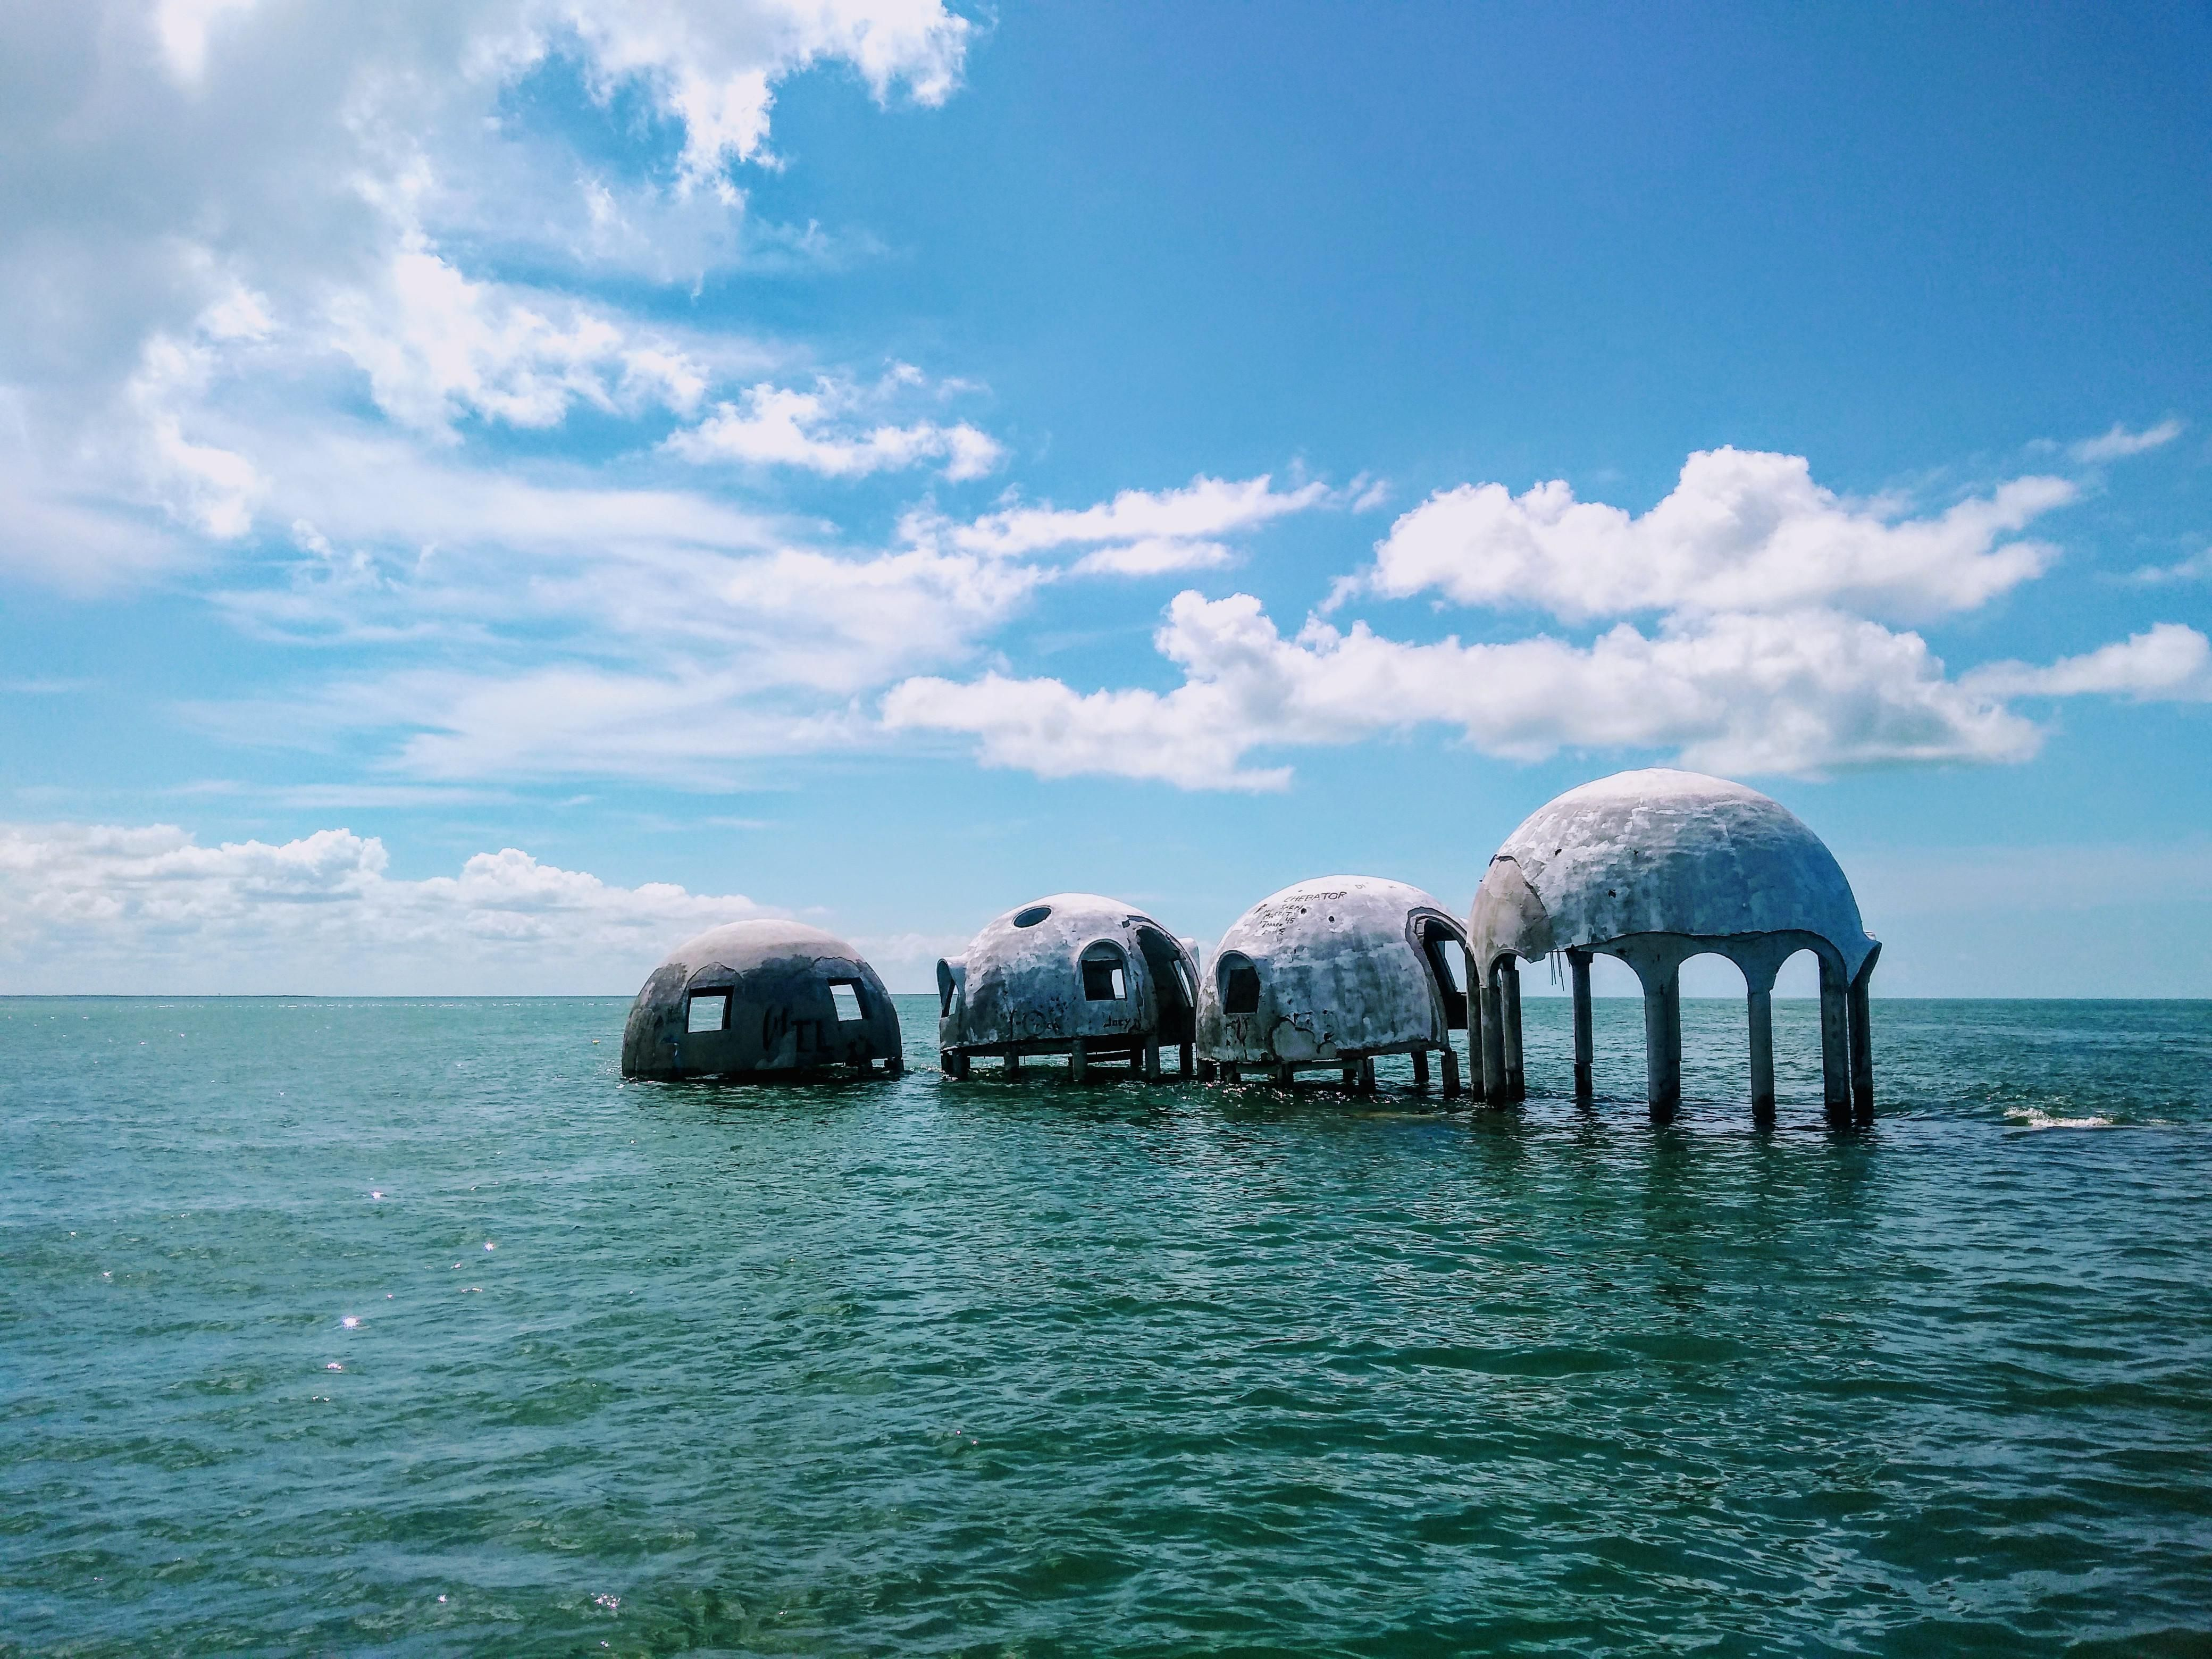 [OC] Cape Romano Dome House located in 10000 Islands of southwest Florida